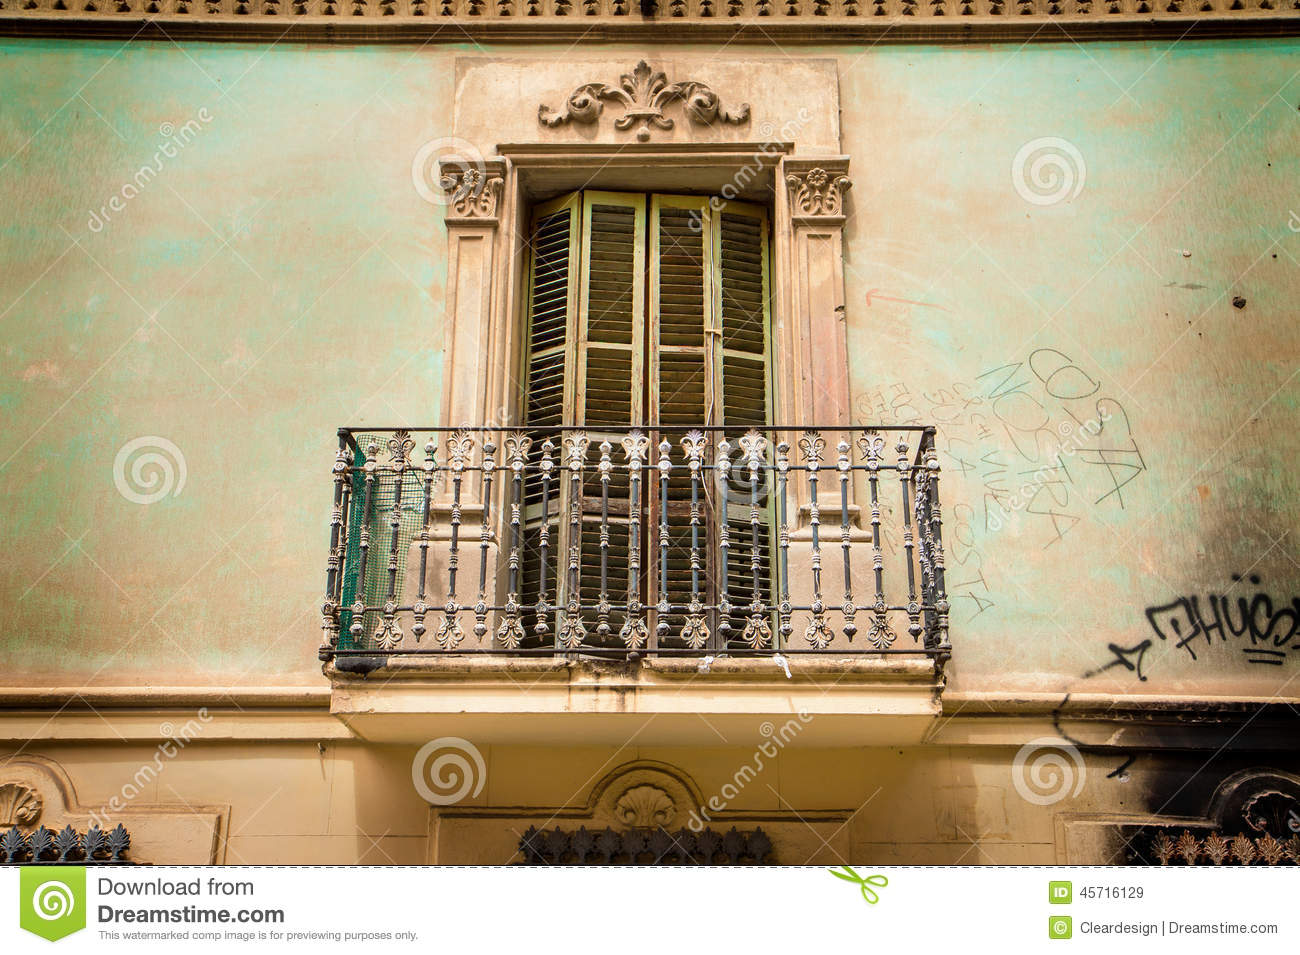 balkon-susleri-ile-evinize-ferahlik-katin-5